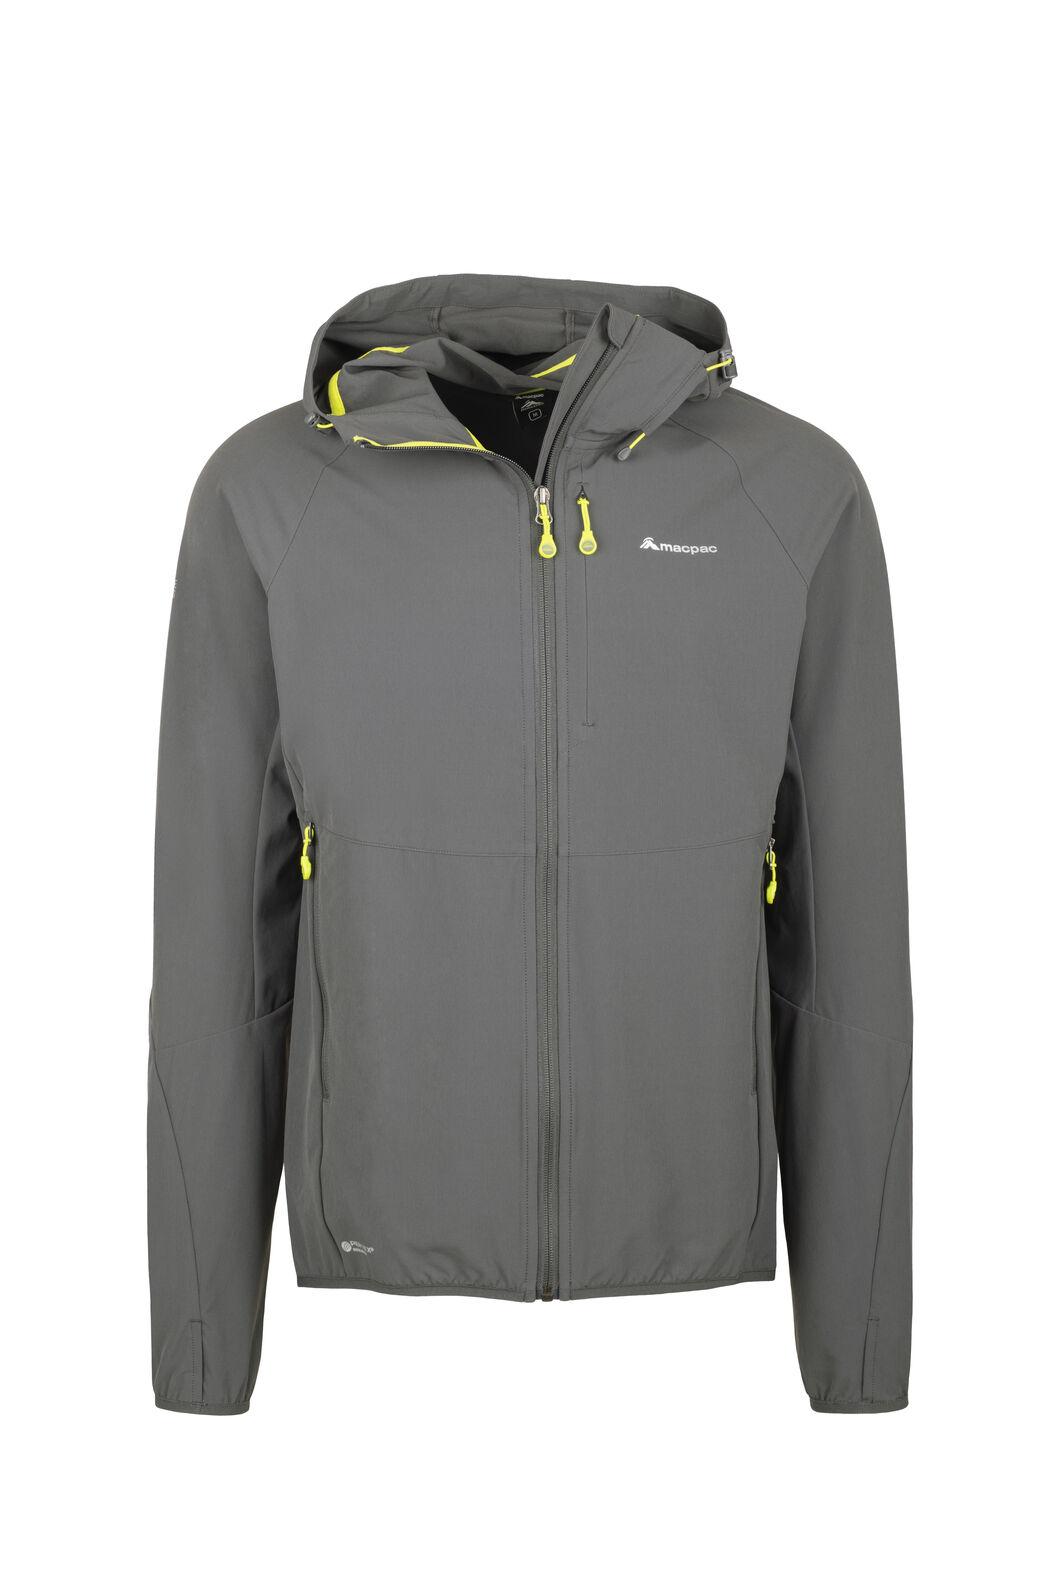 Macpac Mannering Hooded Jacket - Men's, Asphalt, hi-res